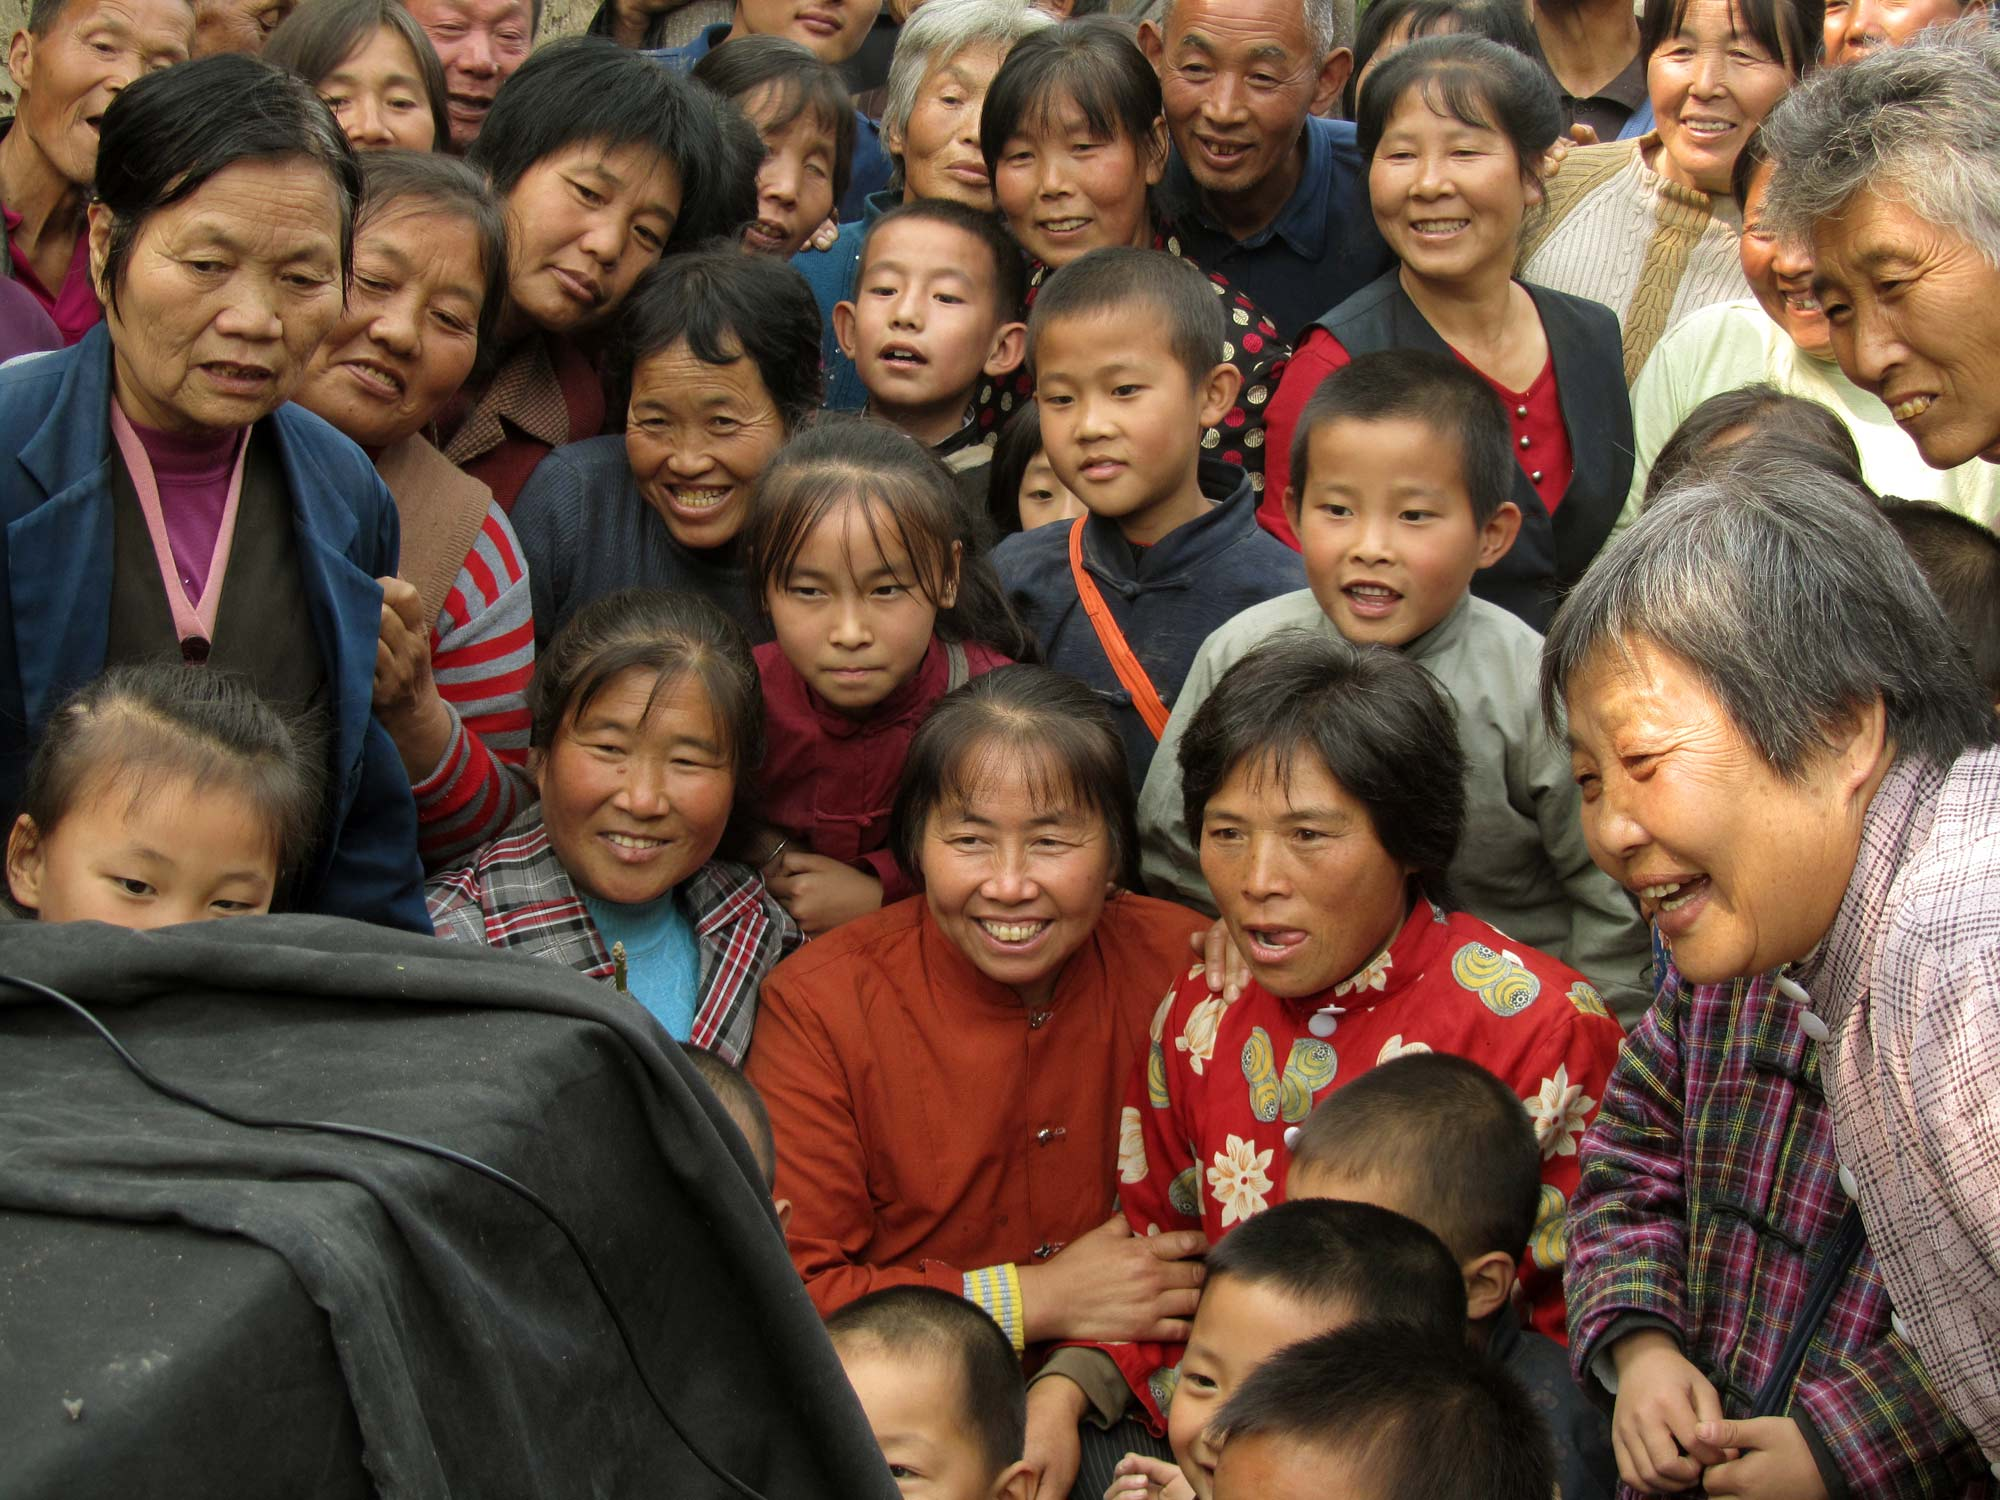 Villagers-around-Monitorwebweb.jpg